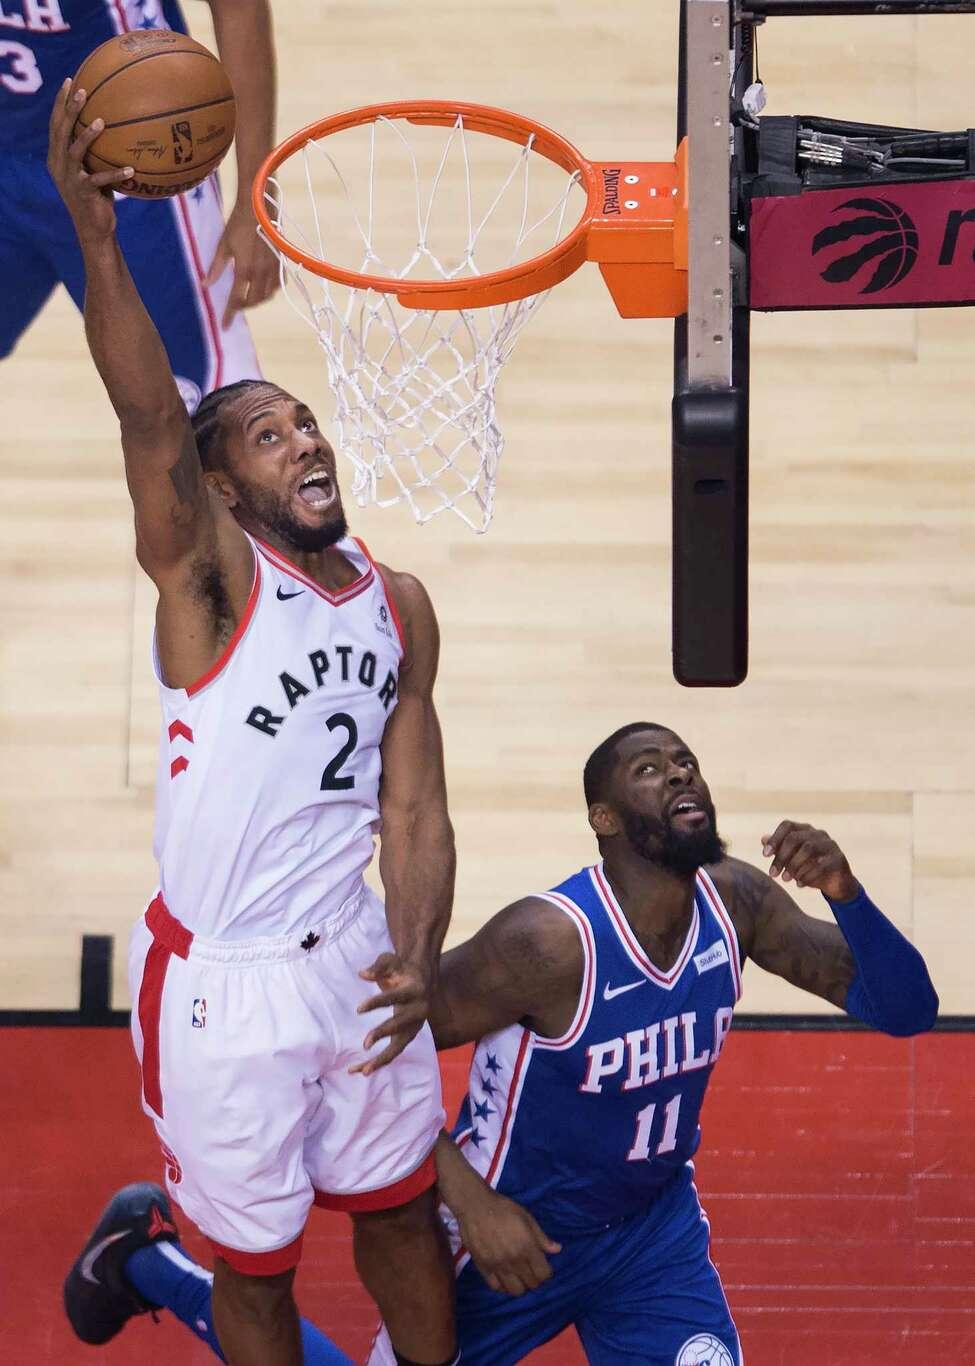 Toronto Raptors forward Kawhi Leonard (2) slam-dunks past Philadelphia 76ers forward James Ennis III (11) during the first half of Game 1 of a second-round NBA basketball playoff series in Toronto, Saturday, April 27, 2019. (Nathan Denette/The Canadian Press via AP)